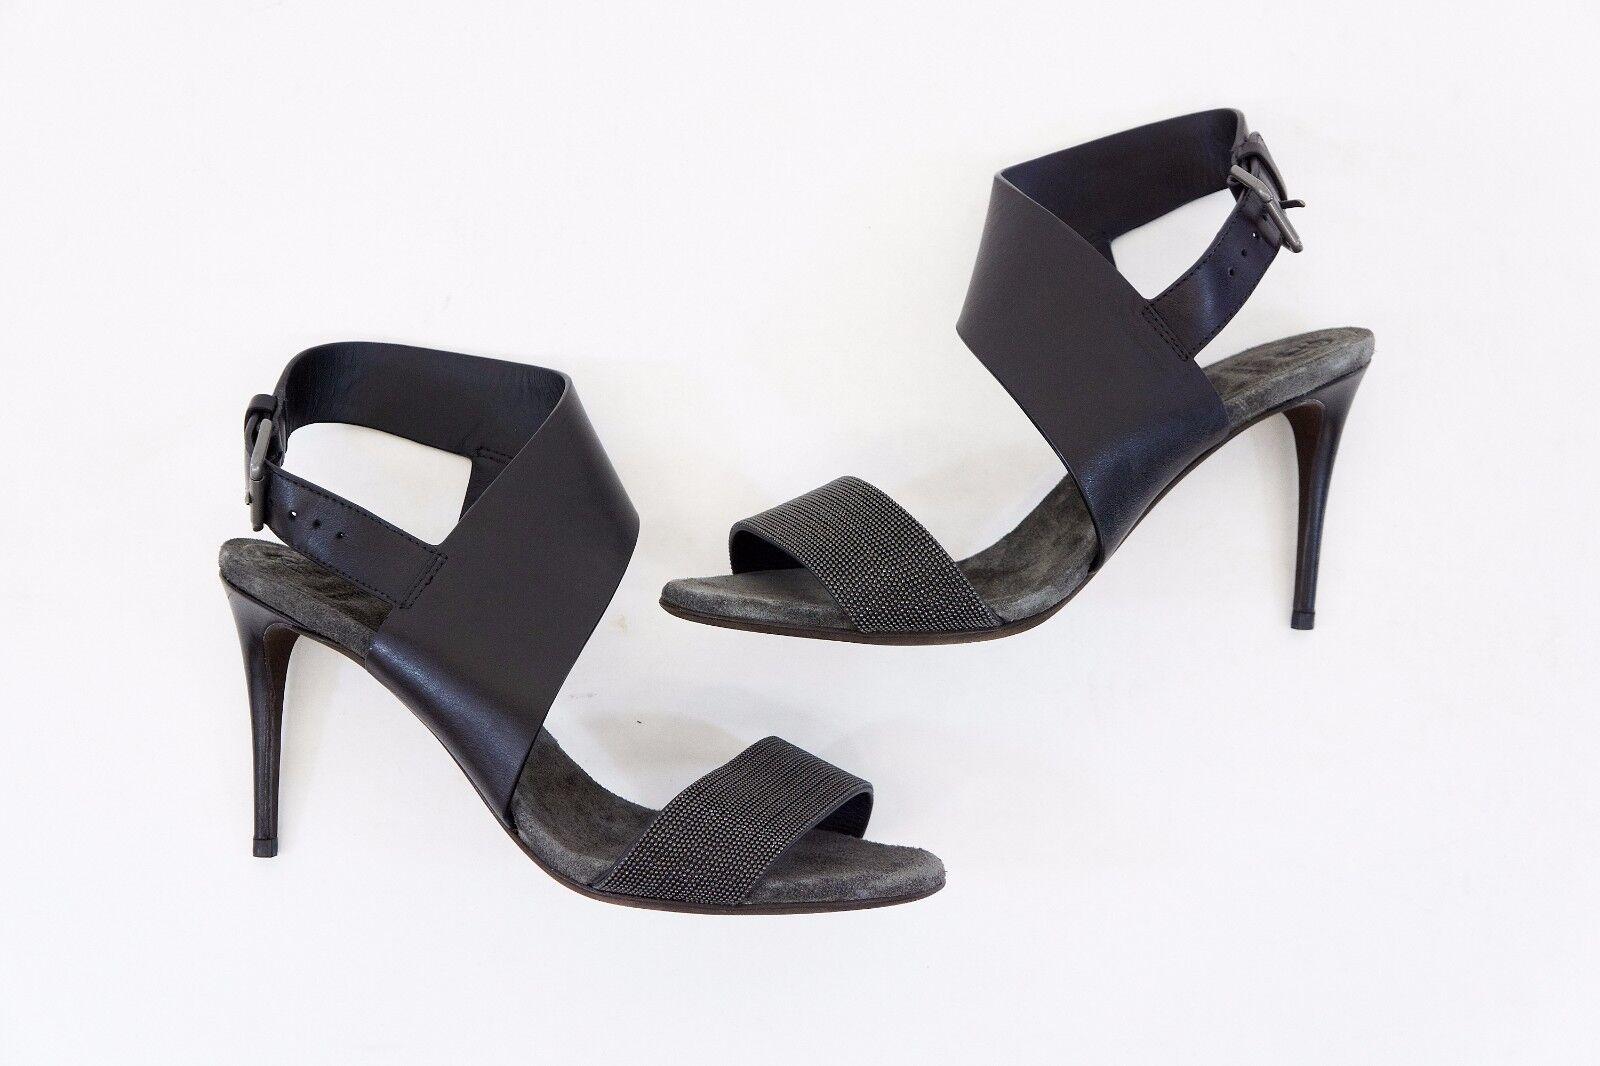 NWOB 1495 Brunello Cucinelli 100%Leather Monili Strap Beaded Slingbacks37 7 A176